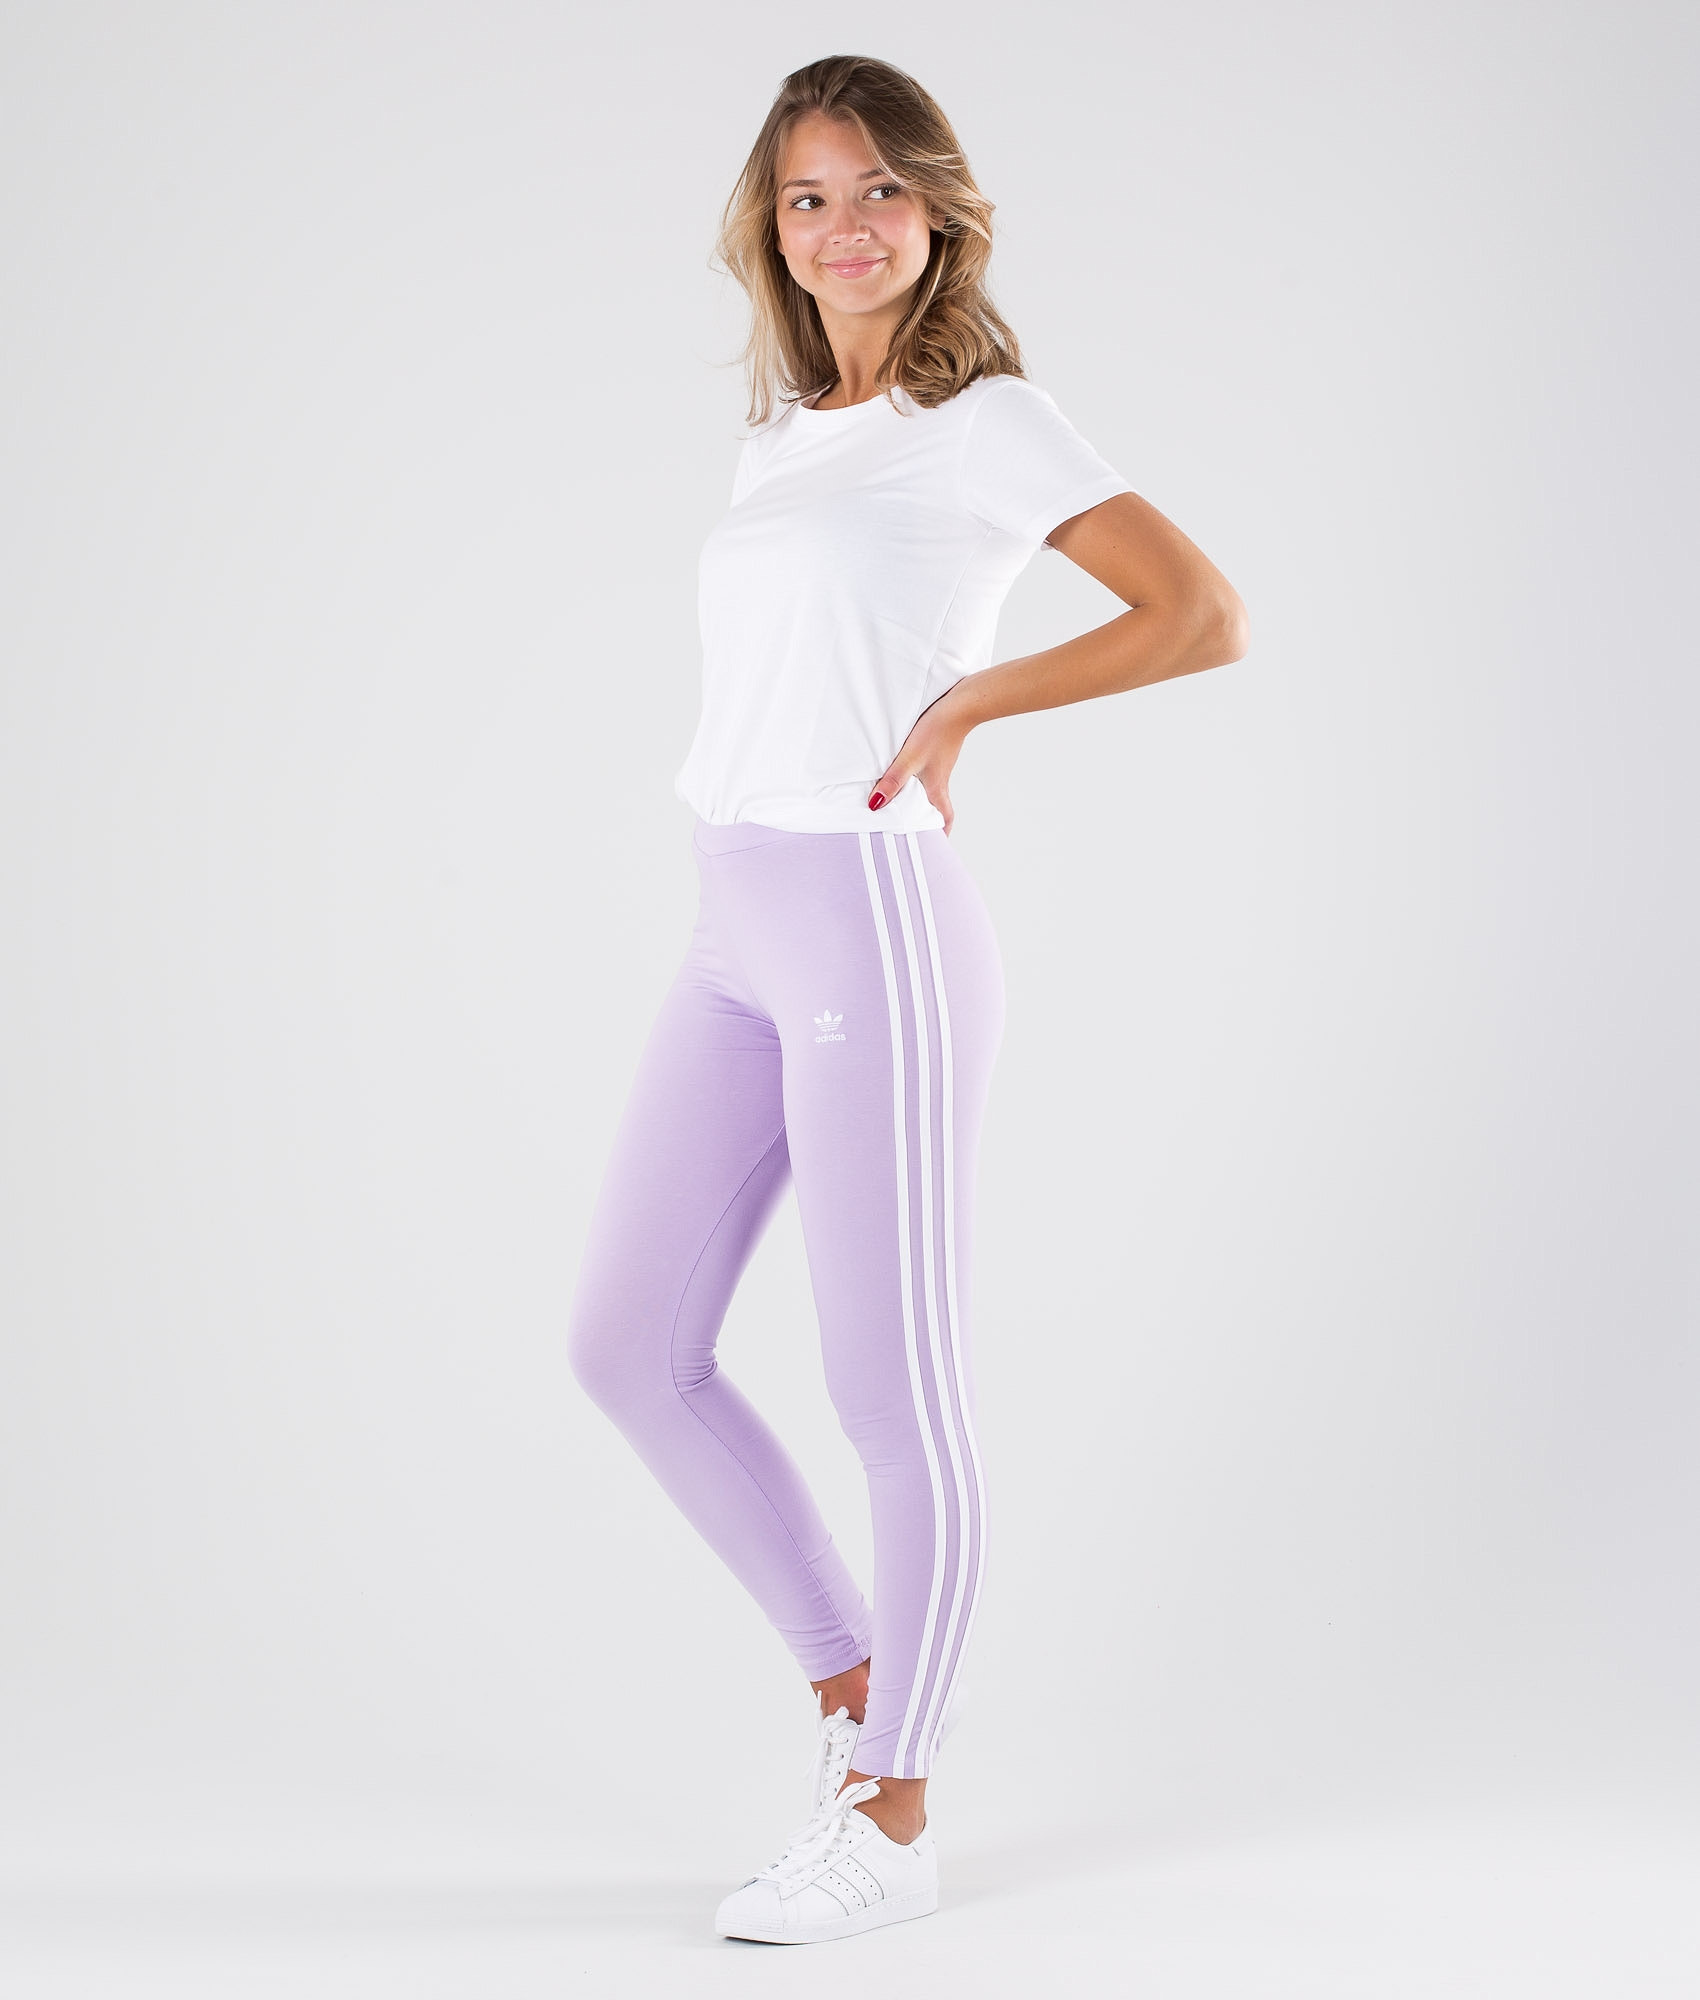 f4d2d064f710c Adidas Originals 3 Stripes Leggings Purple Glow - Ridestore.com